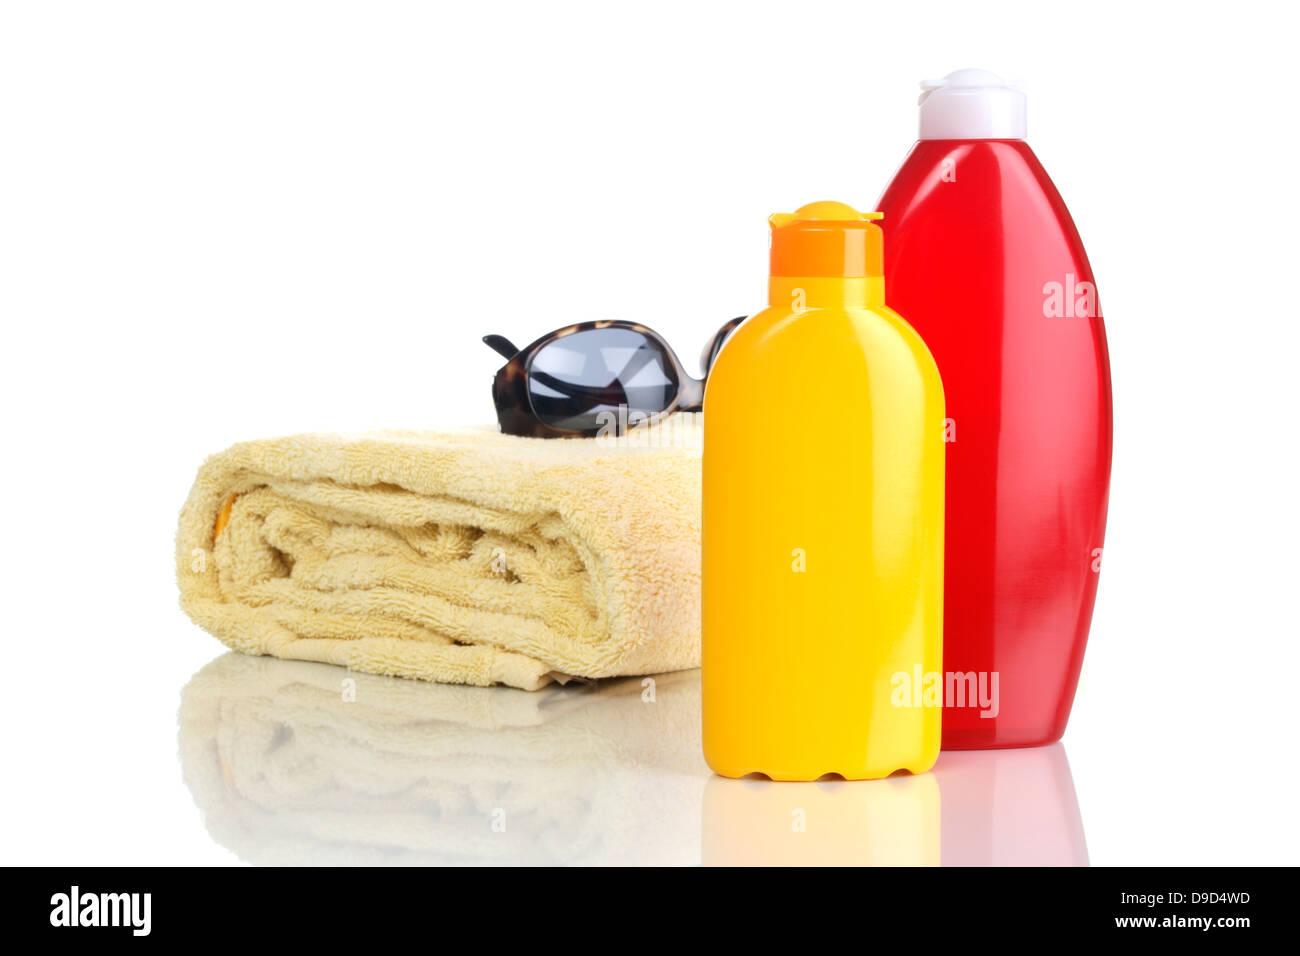 Towel, sunglasses and solar cream - Stock Image